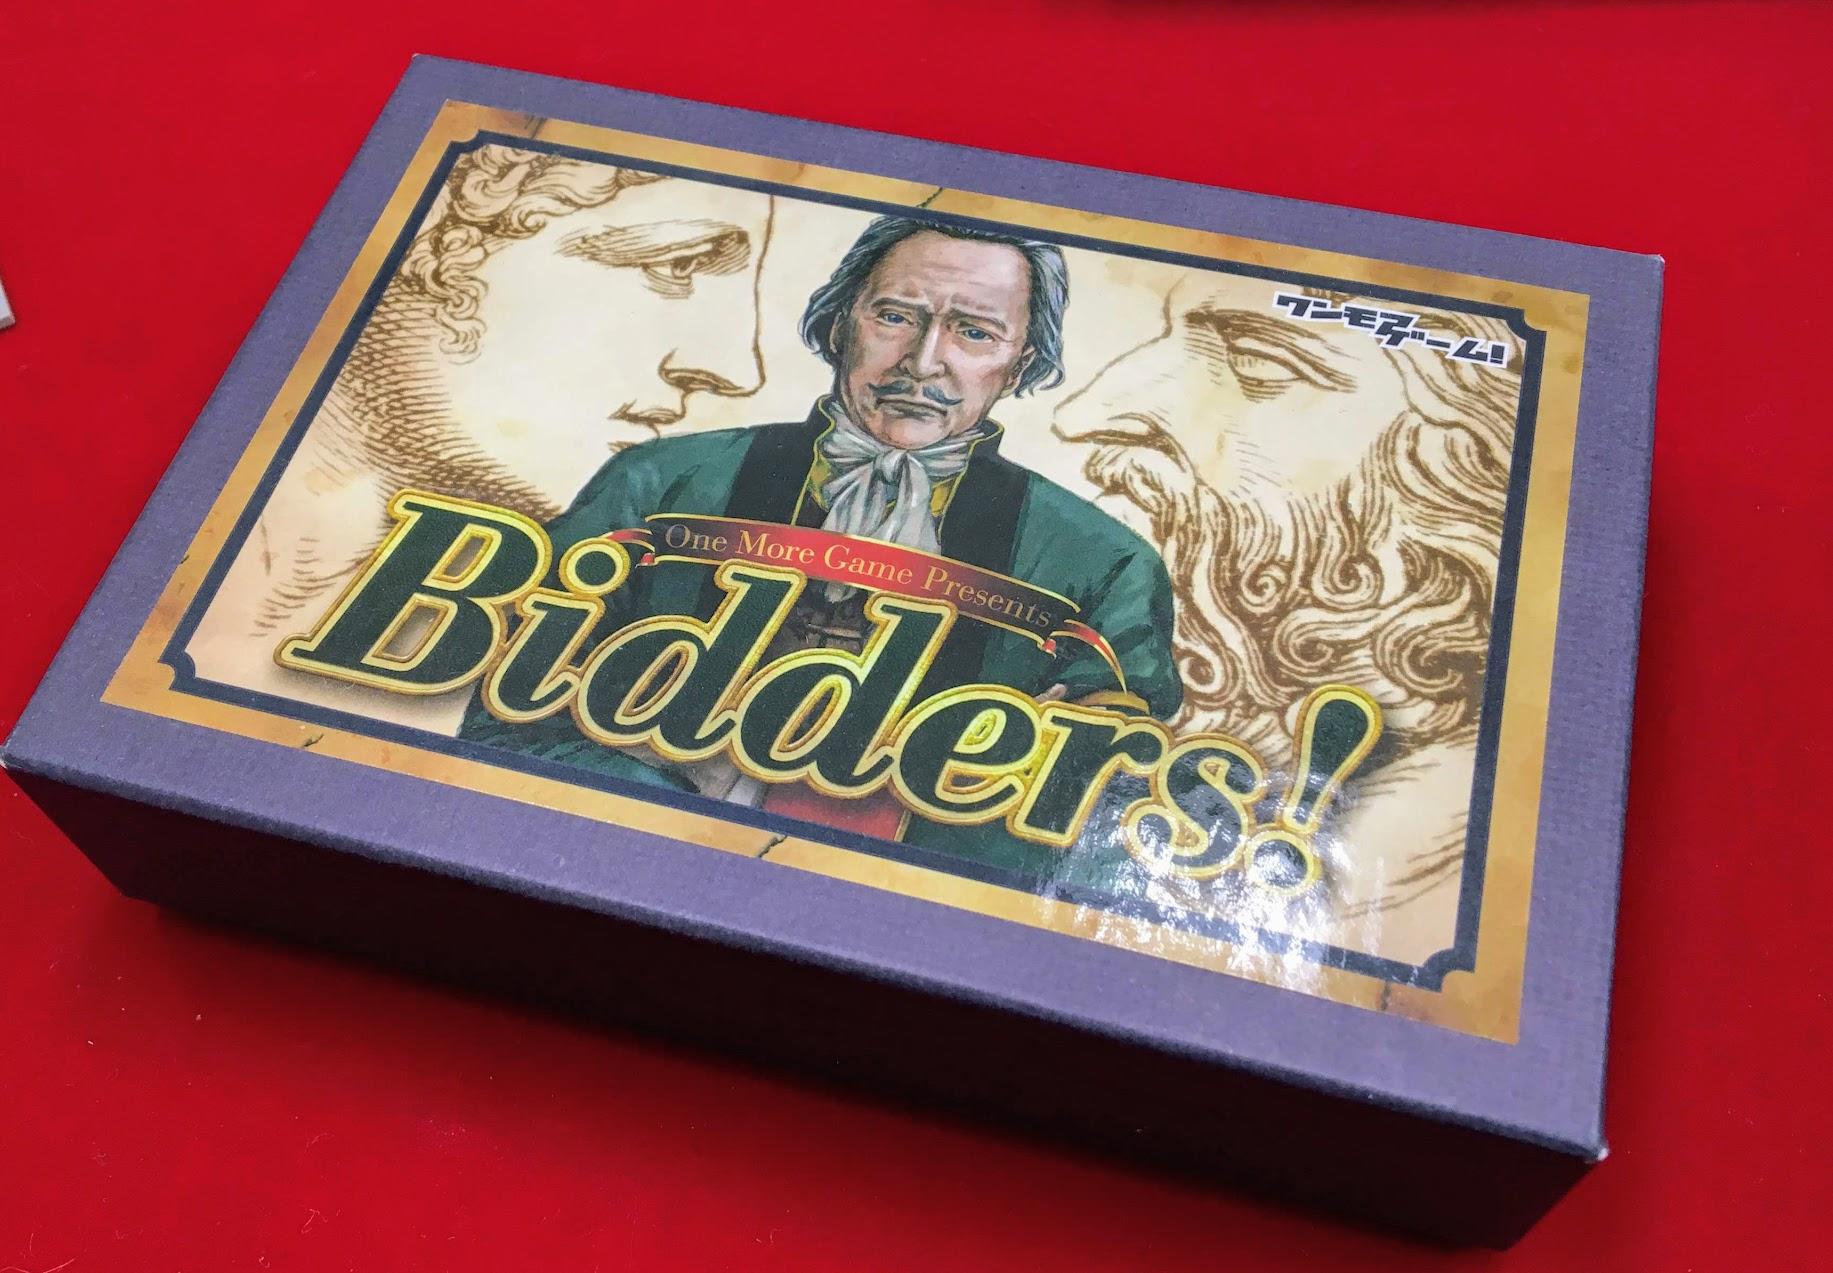 BIDDERS!【レビュー】コンストラクション・フィーバー (Construction Fever)